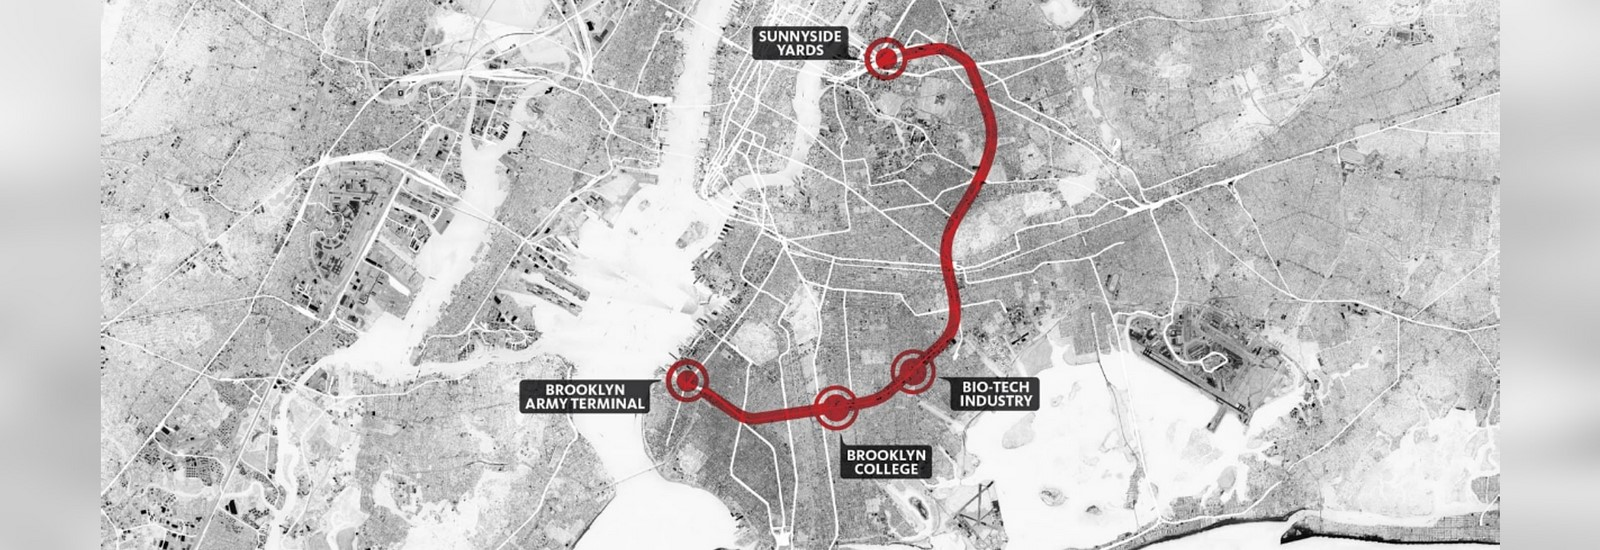 Gensler- 10 Cities & Urban Design Projects Sheet23